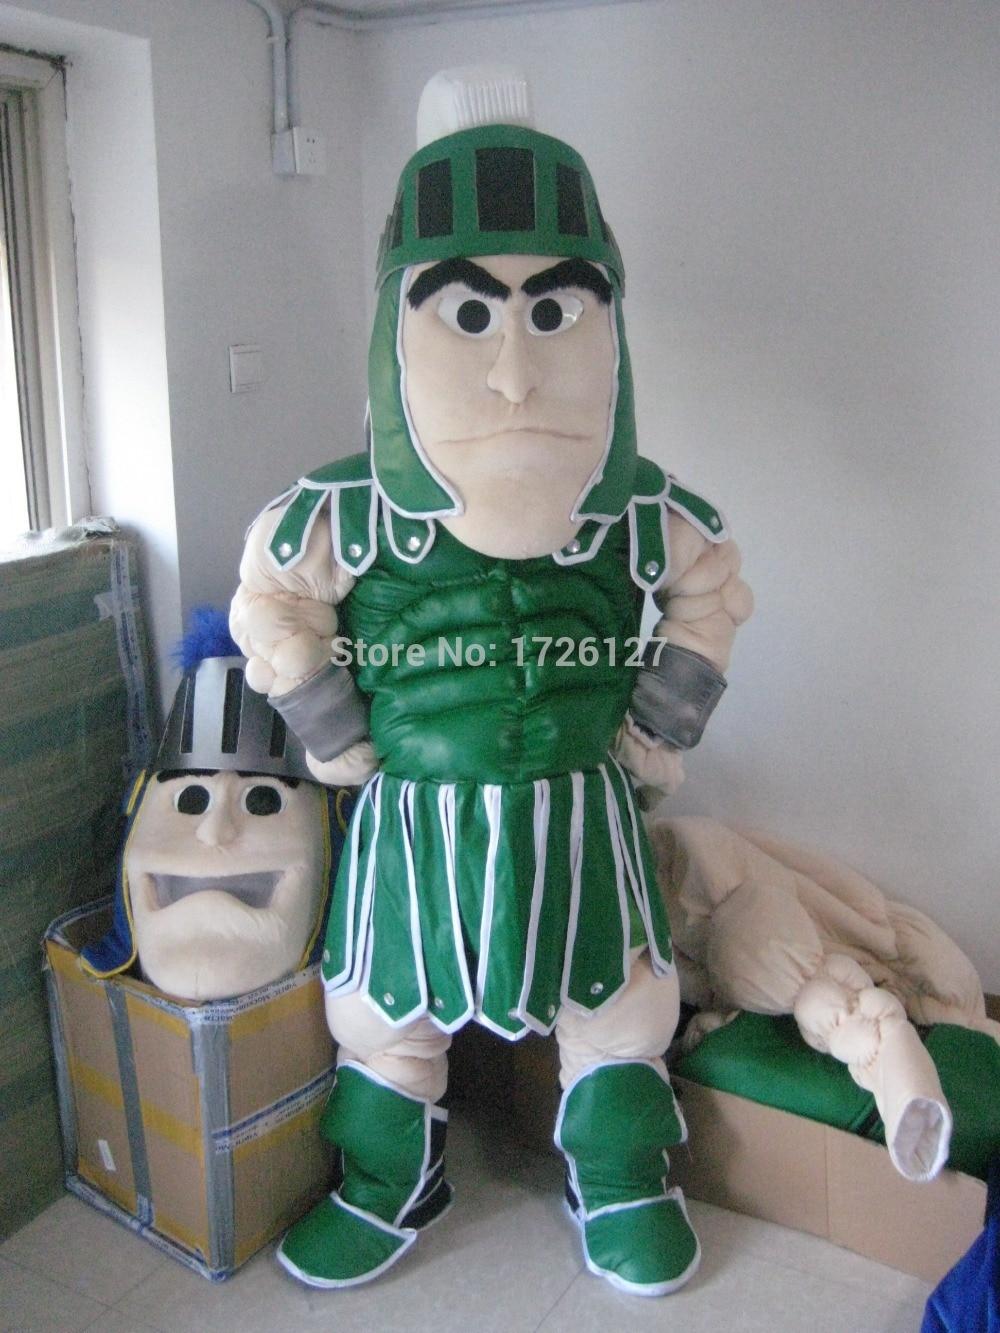 mascot spartan knight mascot trojan costume custom fancy costume cosplay kits mascotte fancy dress carnival costume-in Mascot from Novelty u0026 Special Use on ...  sc 1 st  AliExpress.com & mascot spartan knight mascot trojan costume custom fancy costume ...